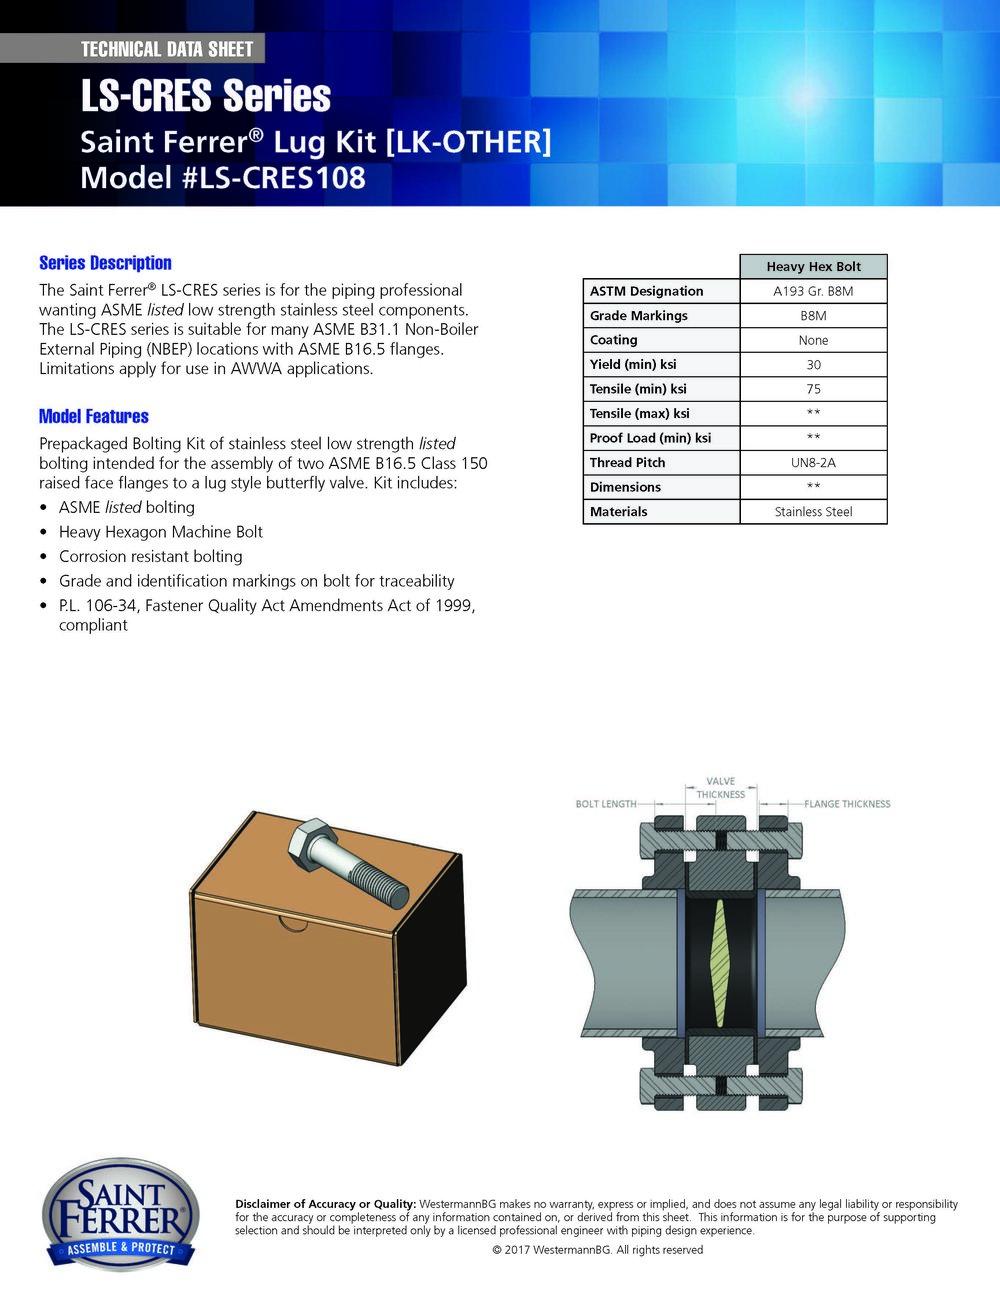 SF_Data_Sheet_LS-CRES_Series_LS-CRES108.jpg